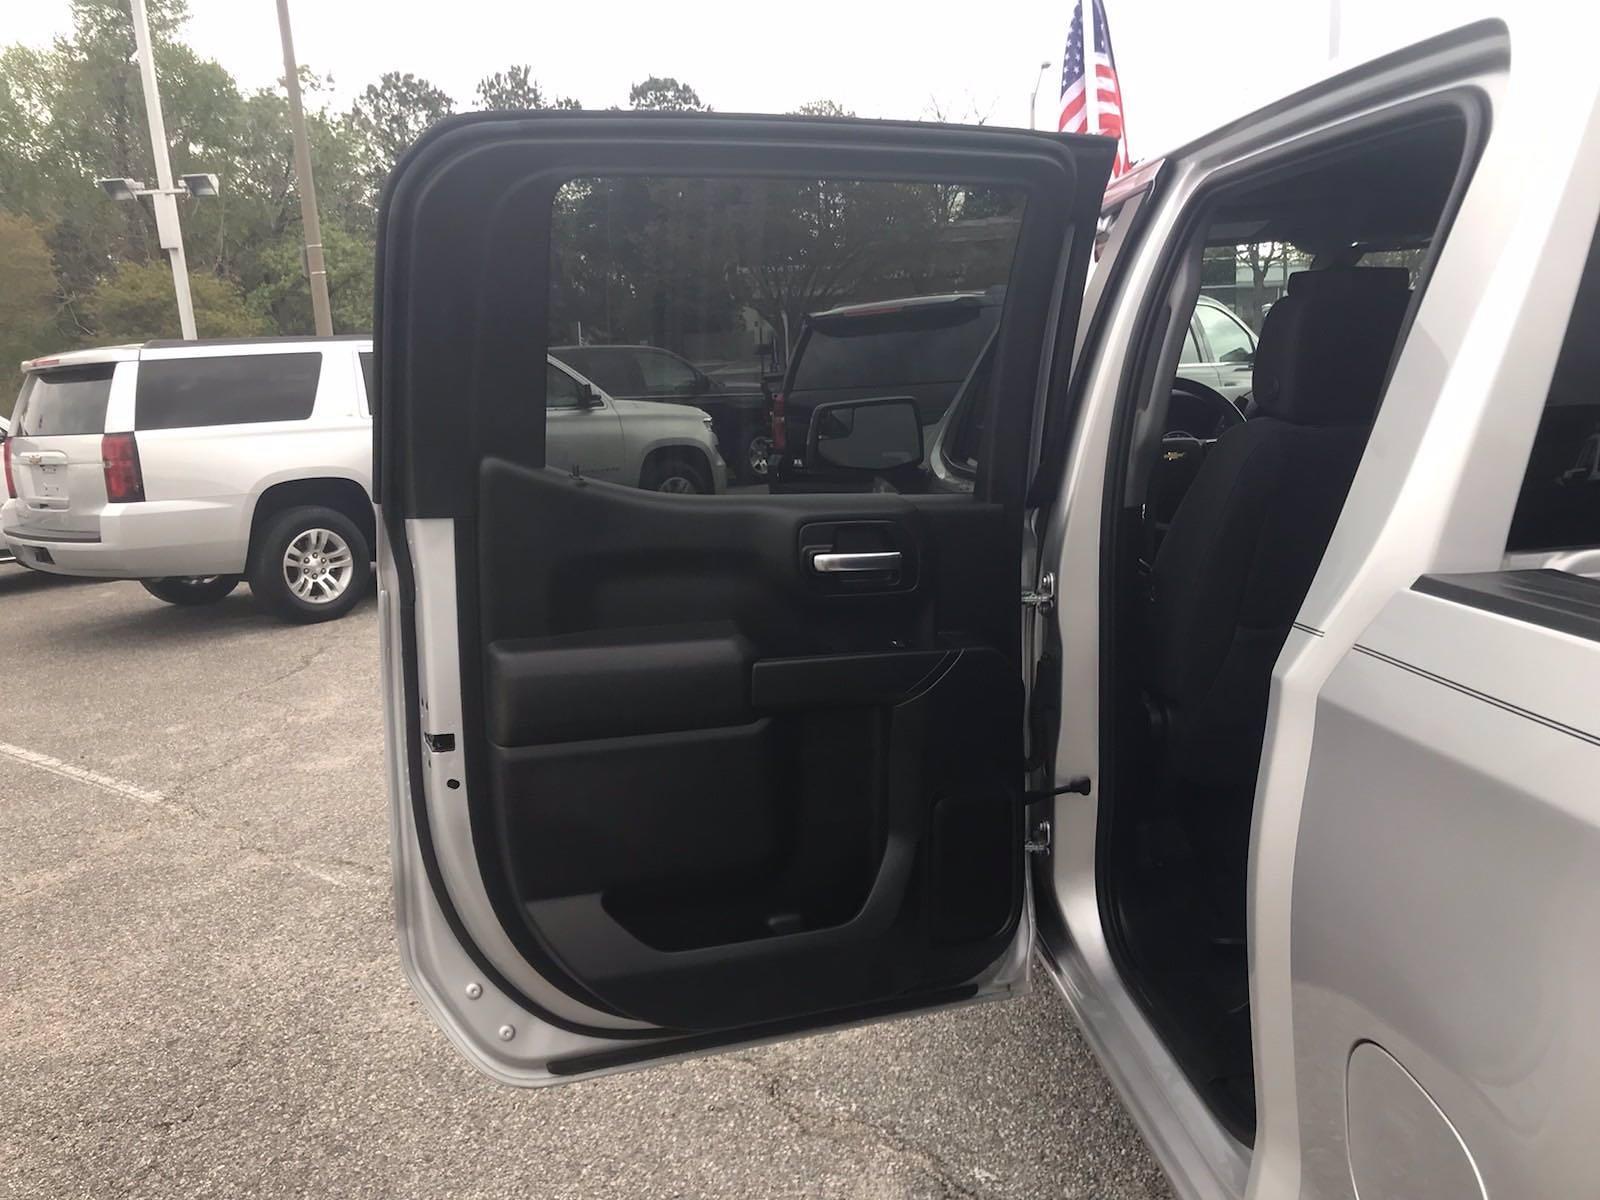 2020 Chevrolet Silverado 1500 Crew Cab 4x4, Pickup #16468P - photo 39